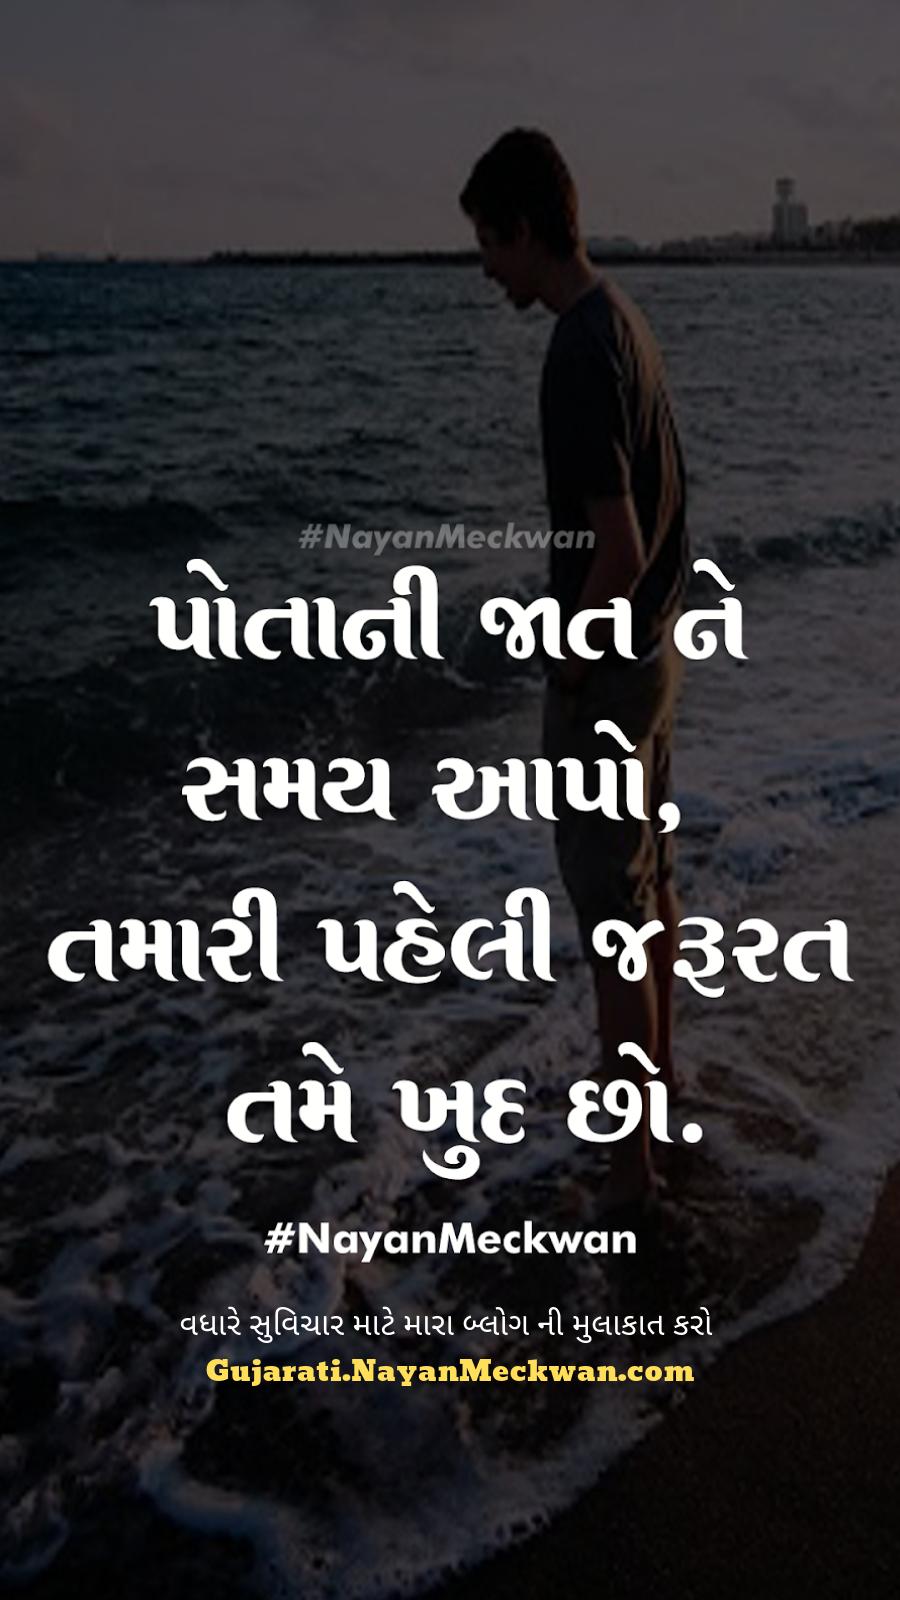 Motivational Inspirational self love ગુજરાતી સુવિચાર suvichar quotes image in Gujarati